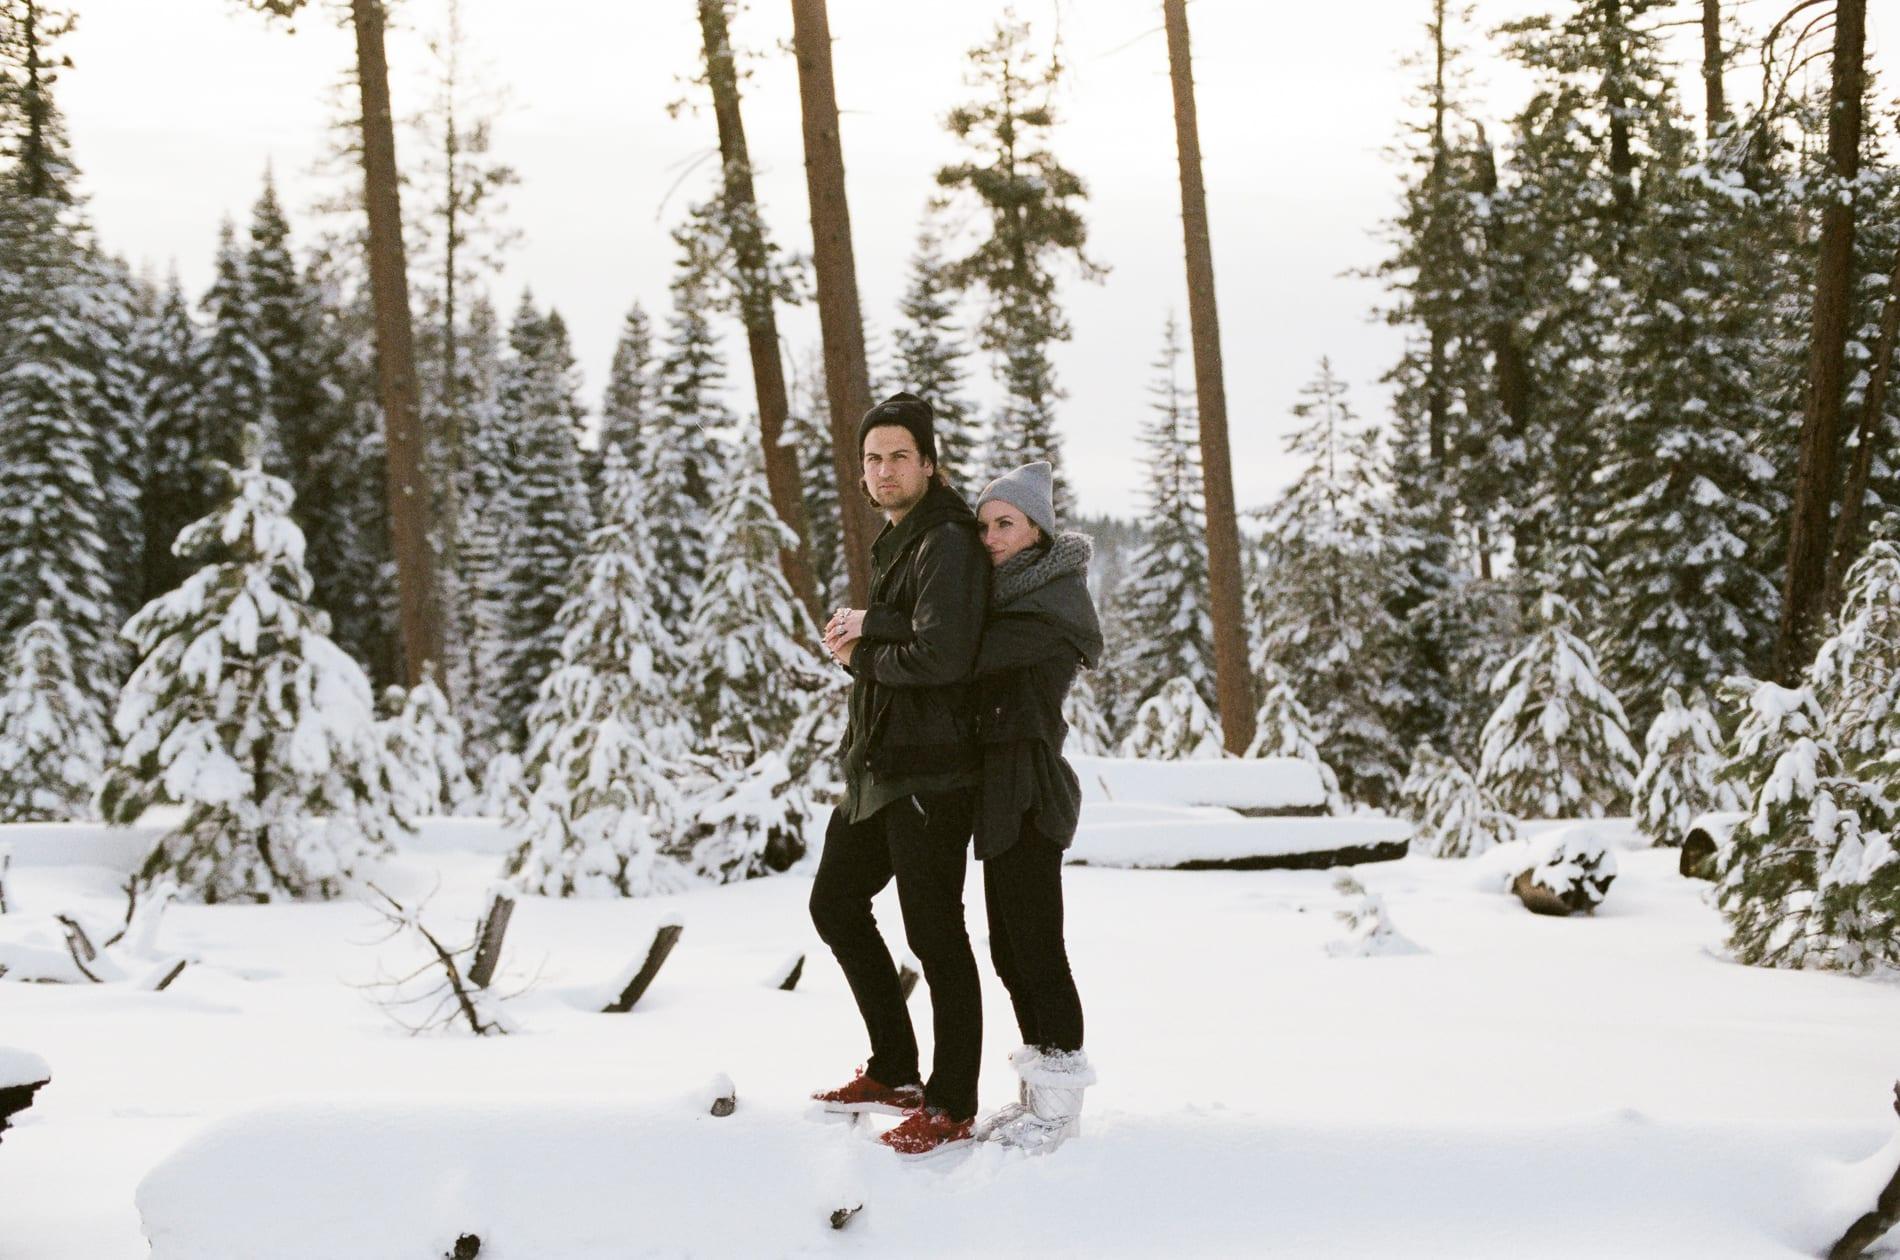 mt-lassen-winter-snow-couples-photo-10